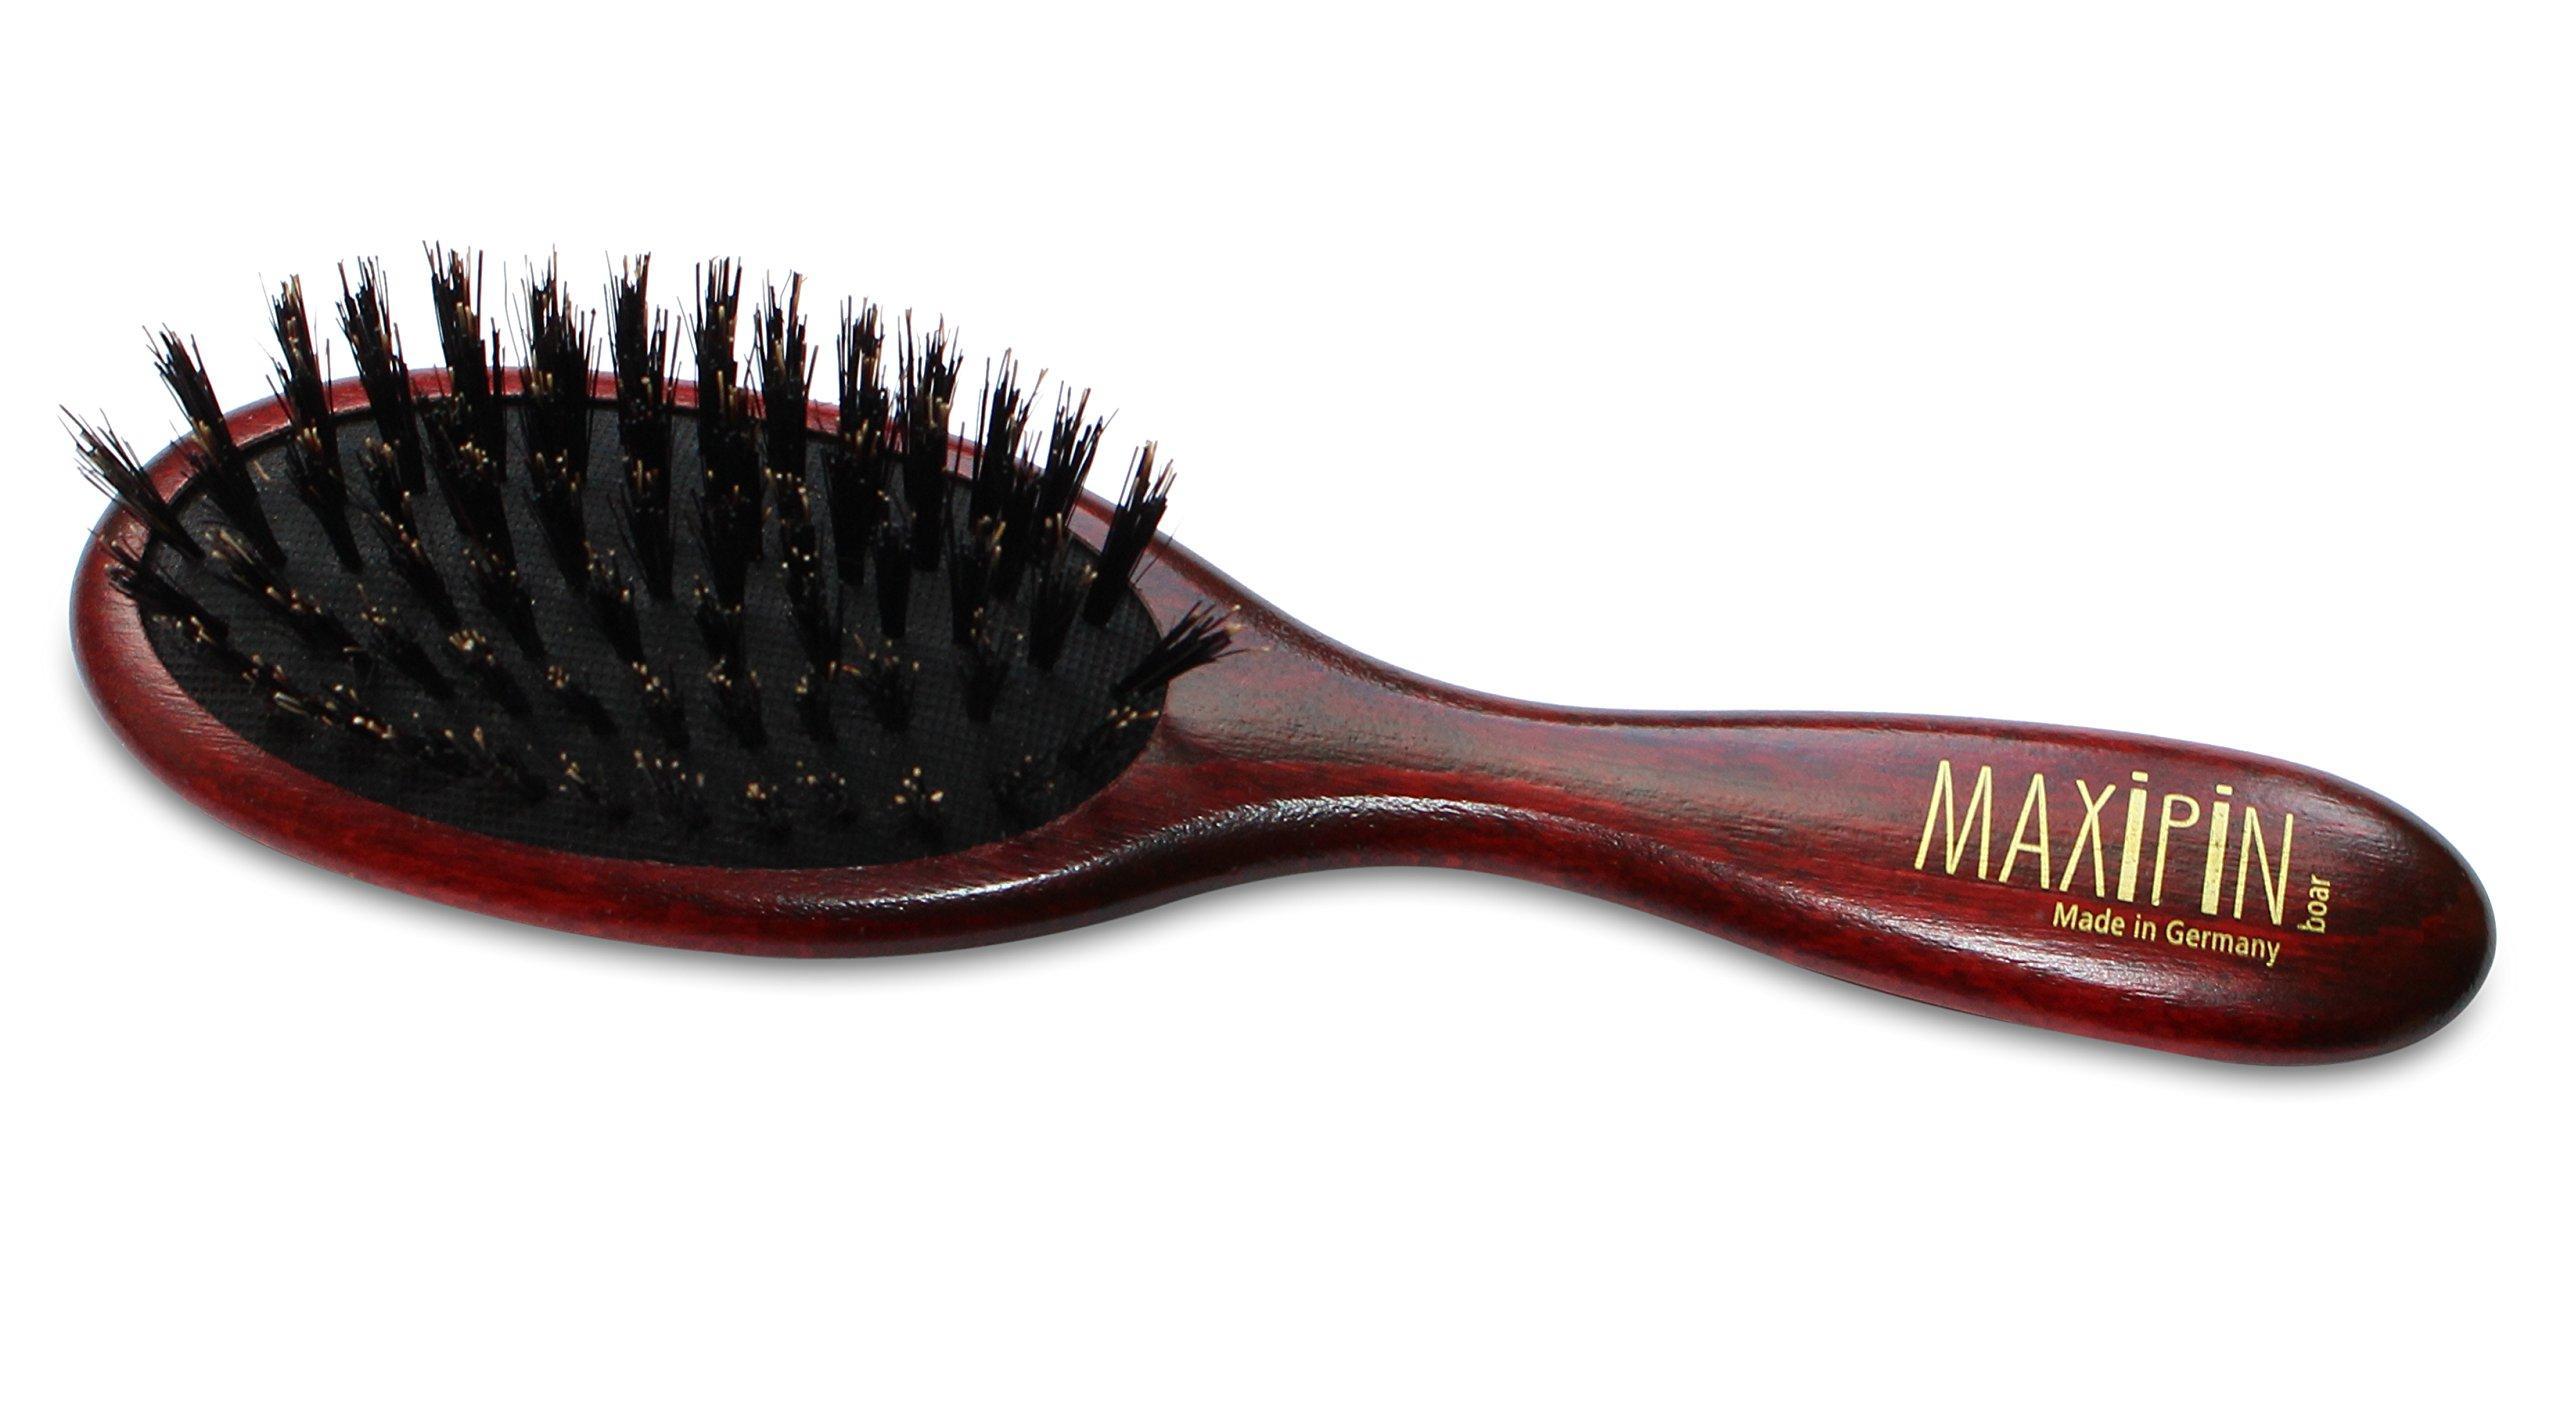 Mars Professional Advanced Maxipin Boar Bristle Dog Hair Brush, Solid Wood Handle and Boar Bristles, 7.25'' Length